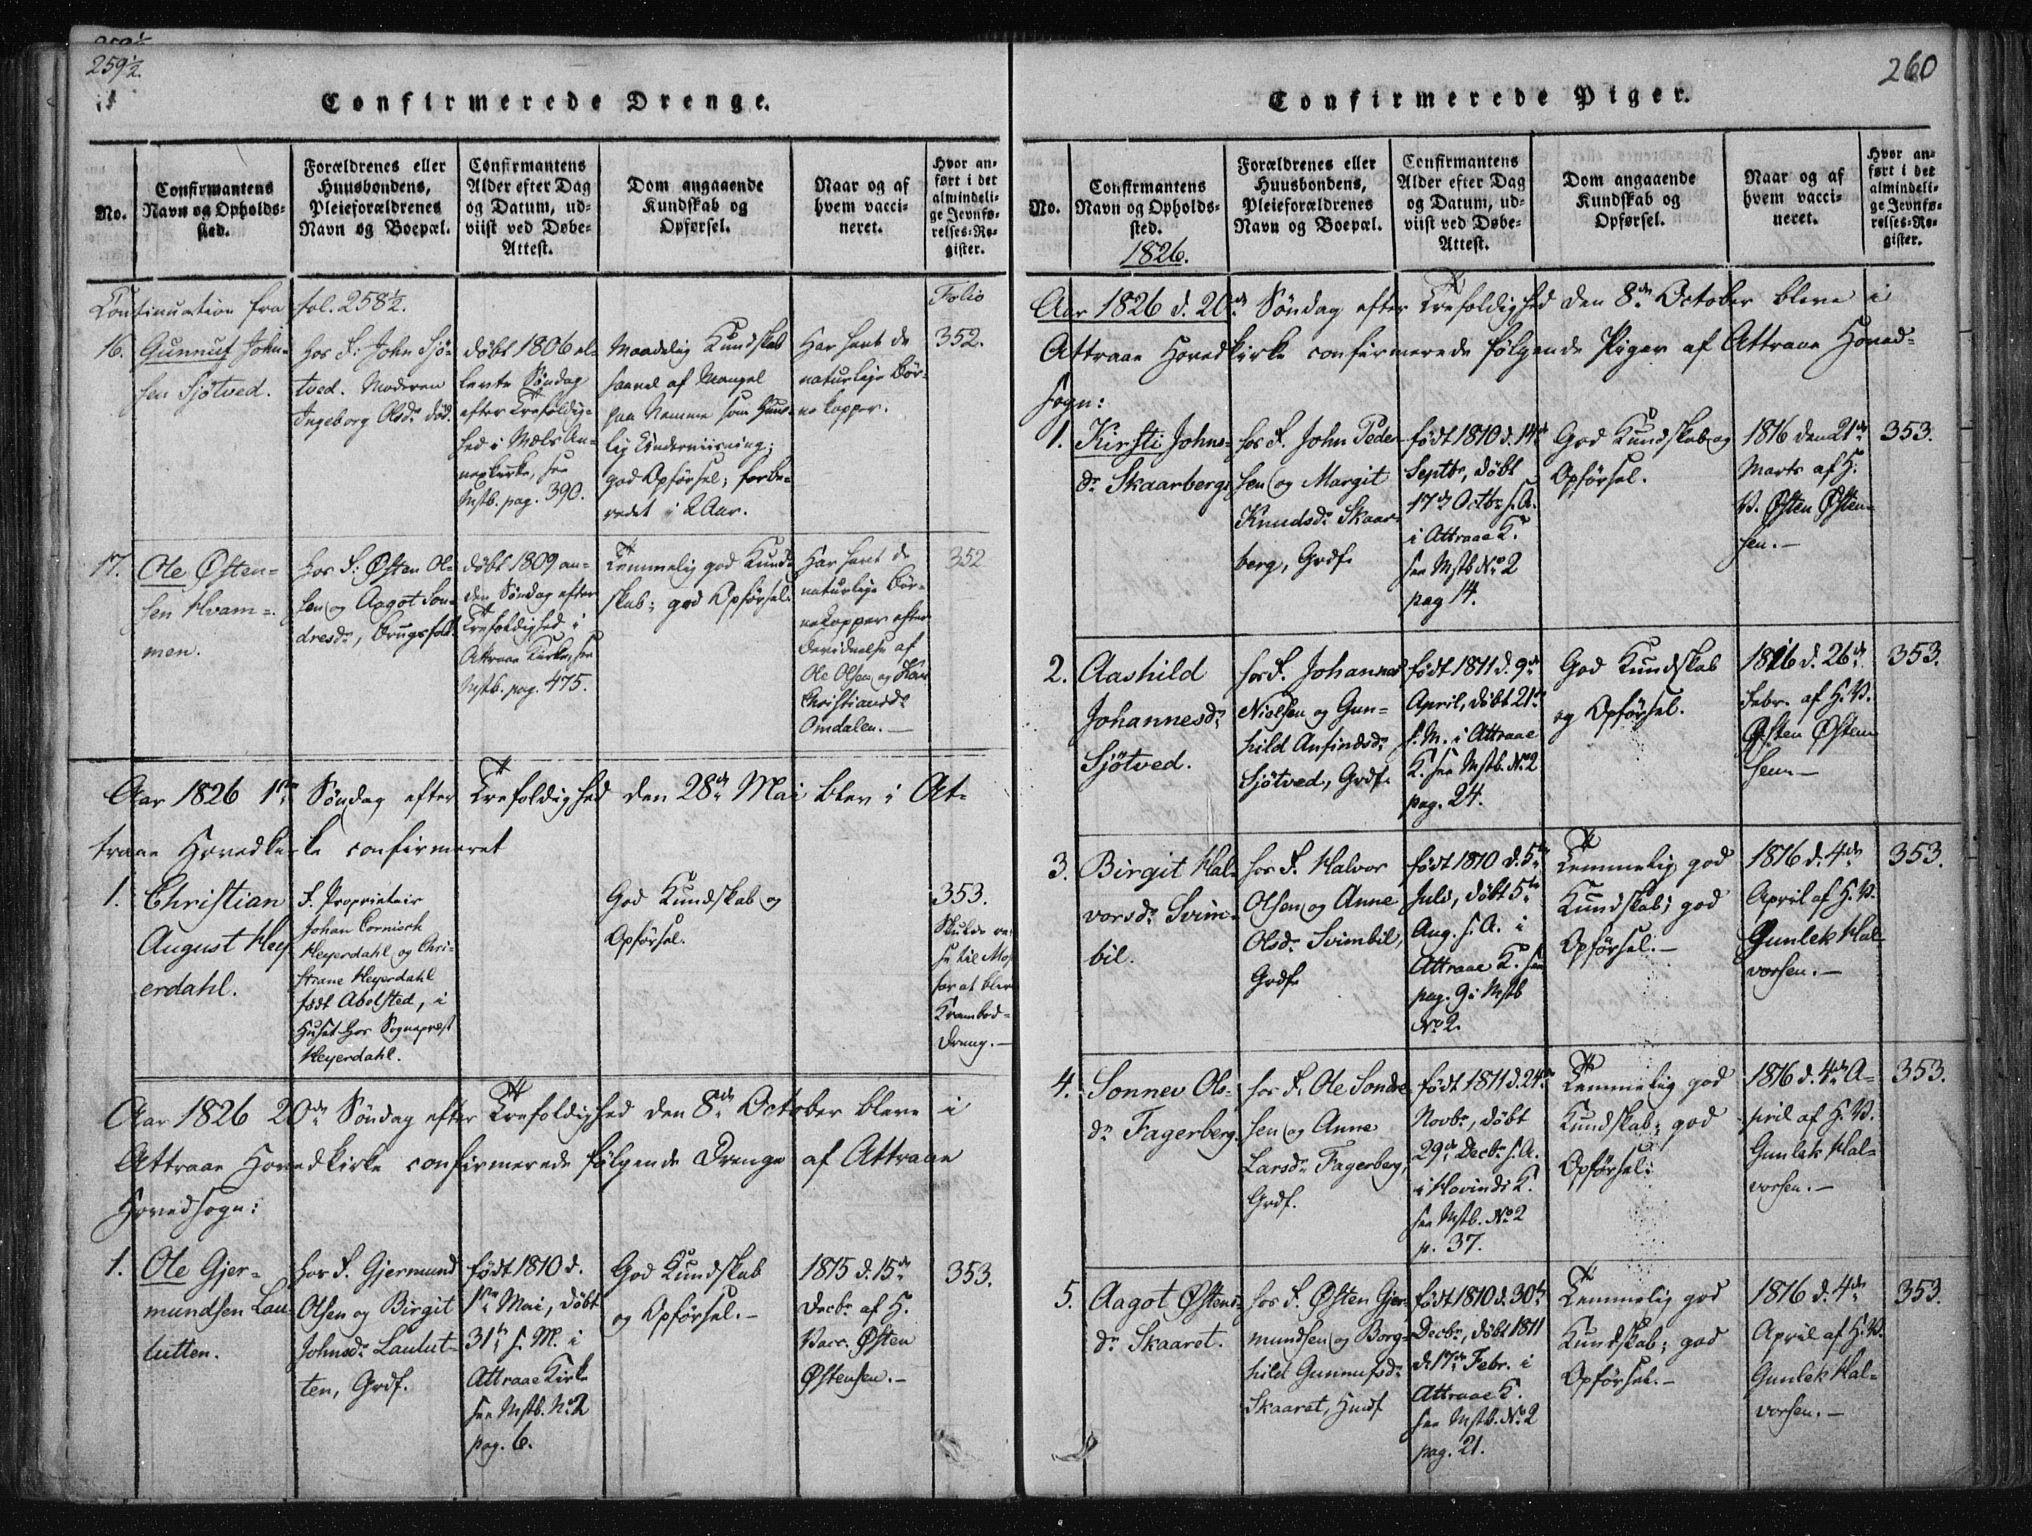 SAKO, Tinn kirkebøker, F/Fa/L0004: Ministerialbok nr. I 4, 1815-1843, s. 260